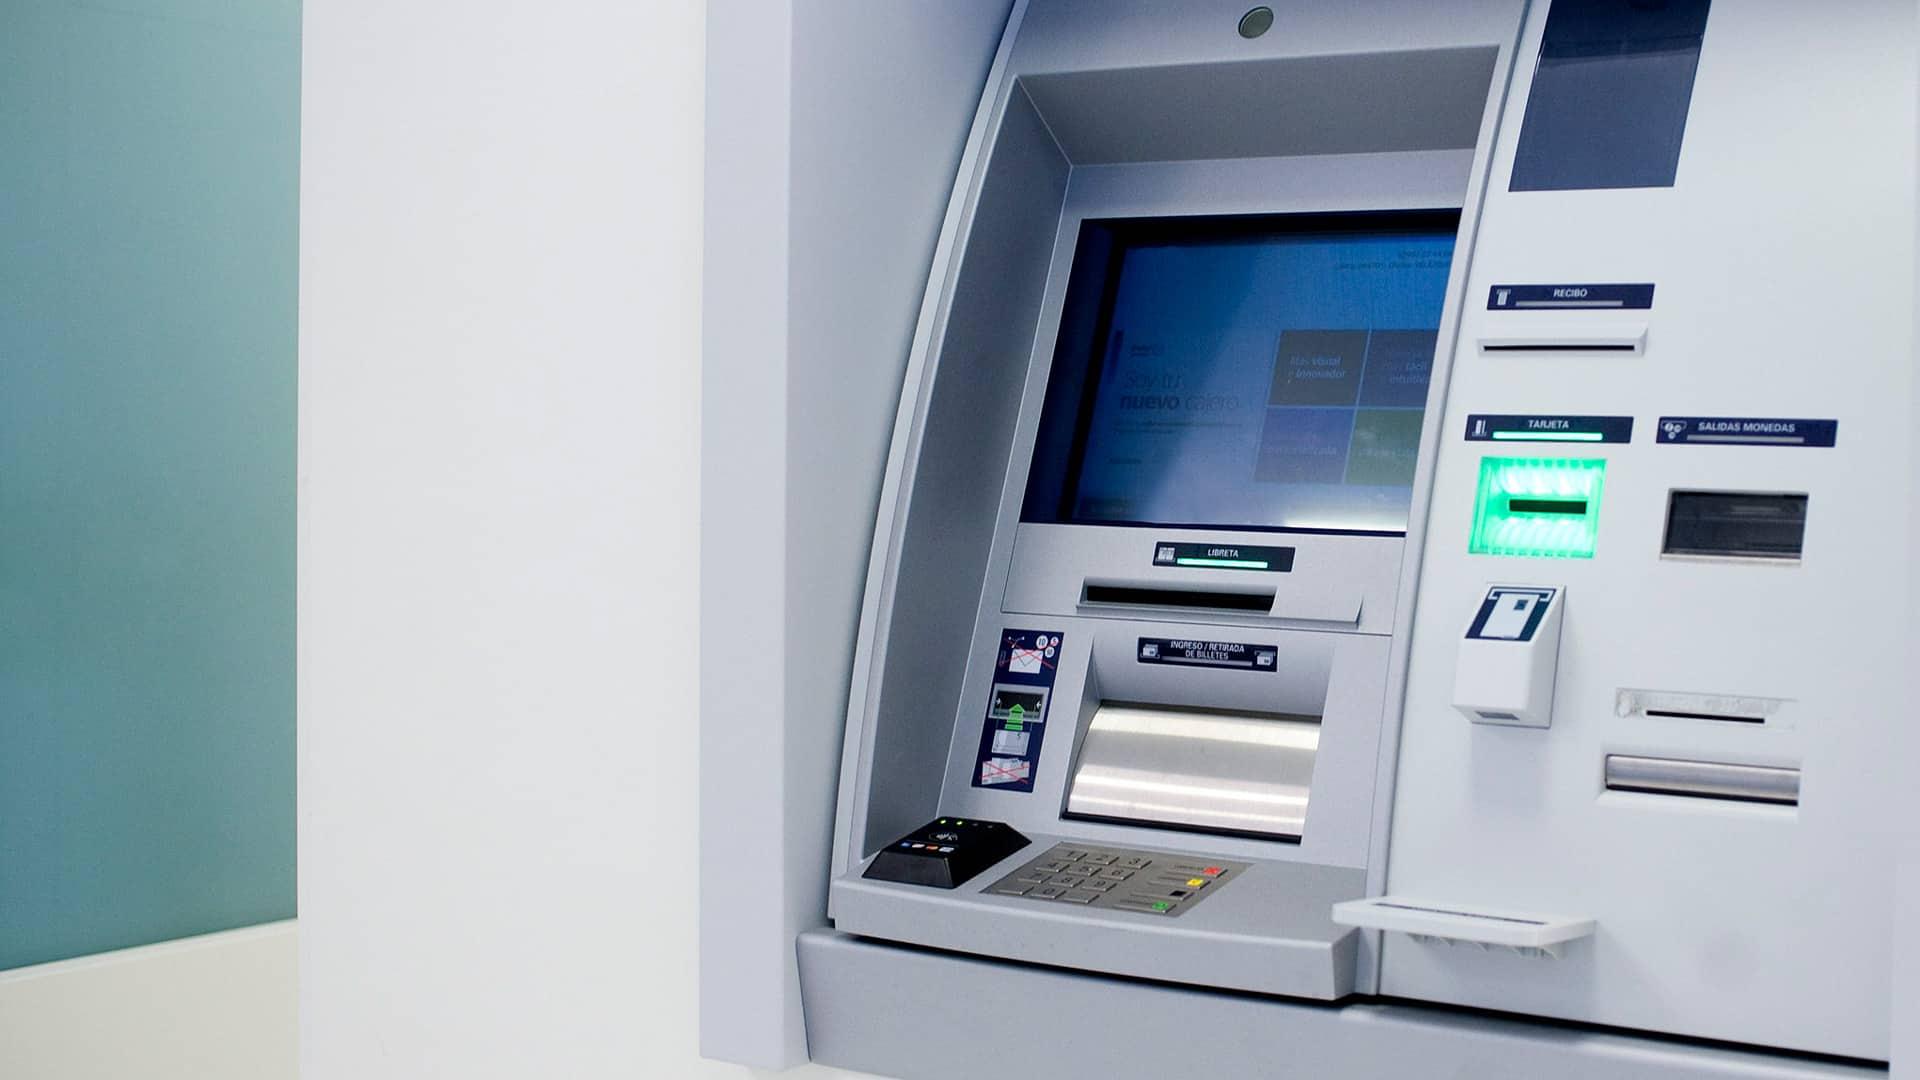 Sacar dinero sin tarjeta EVO Banco: servicio Hal Cash